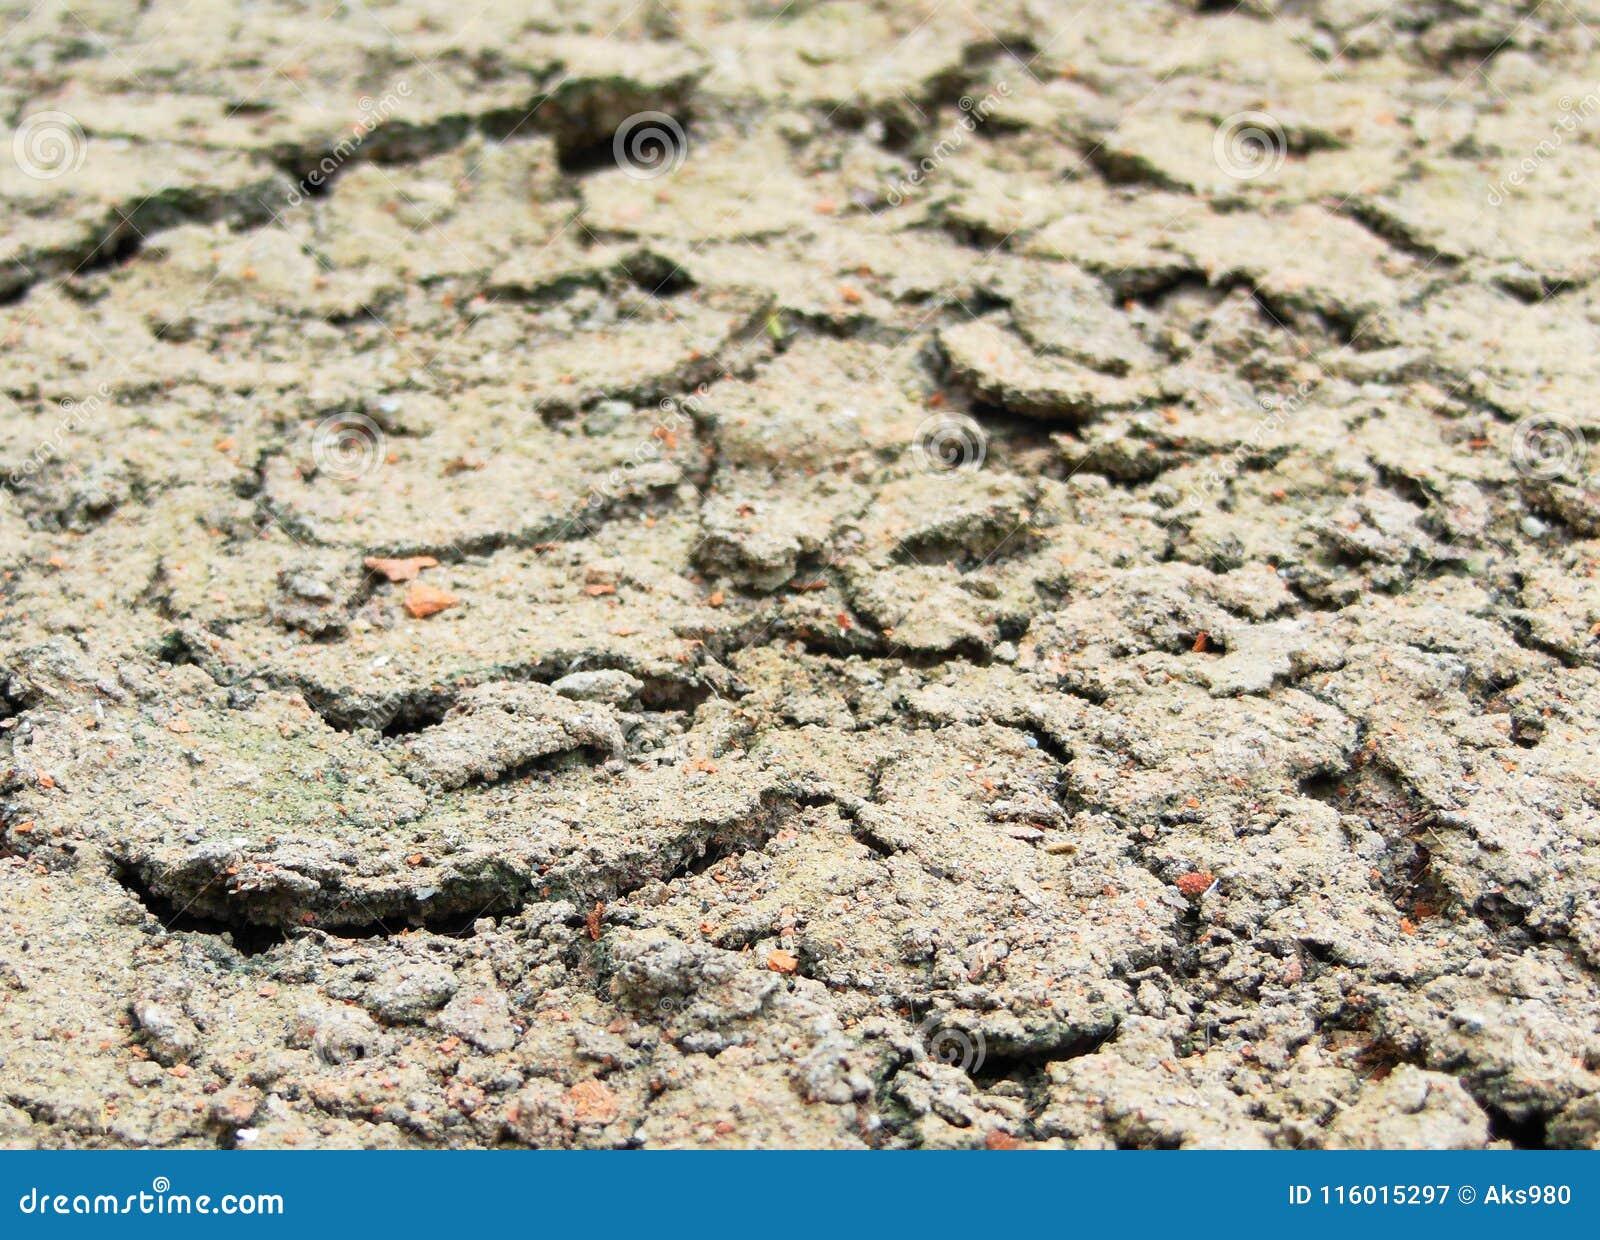 dry draught cracked grey soil terrain texture summer